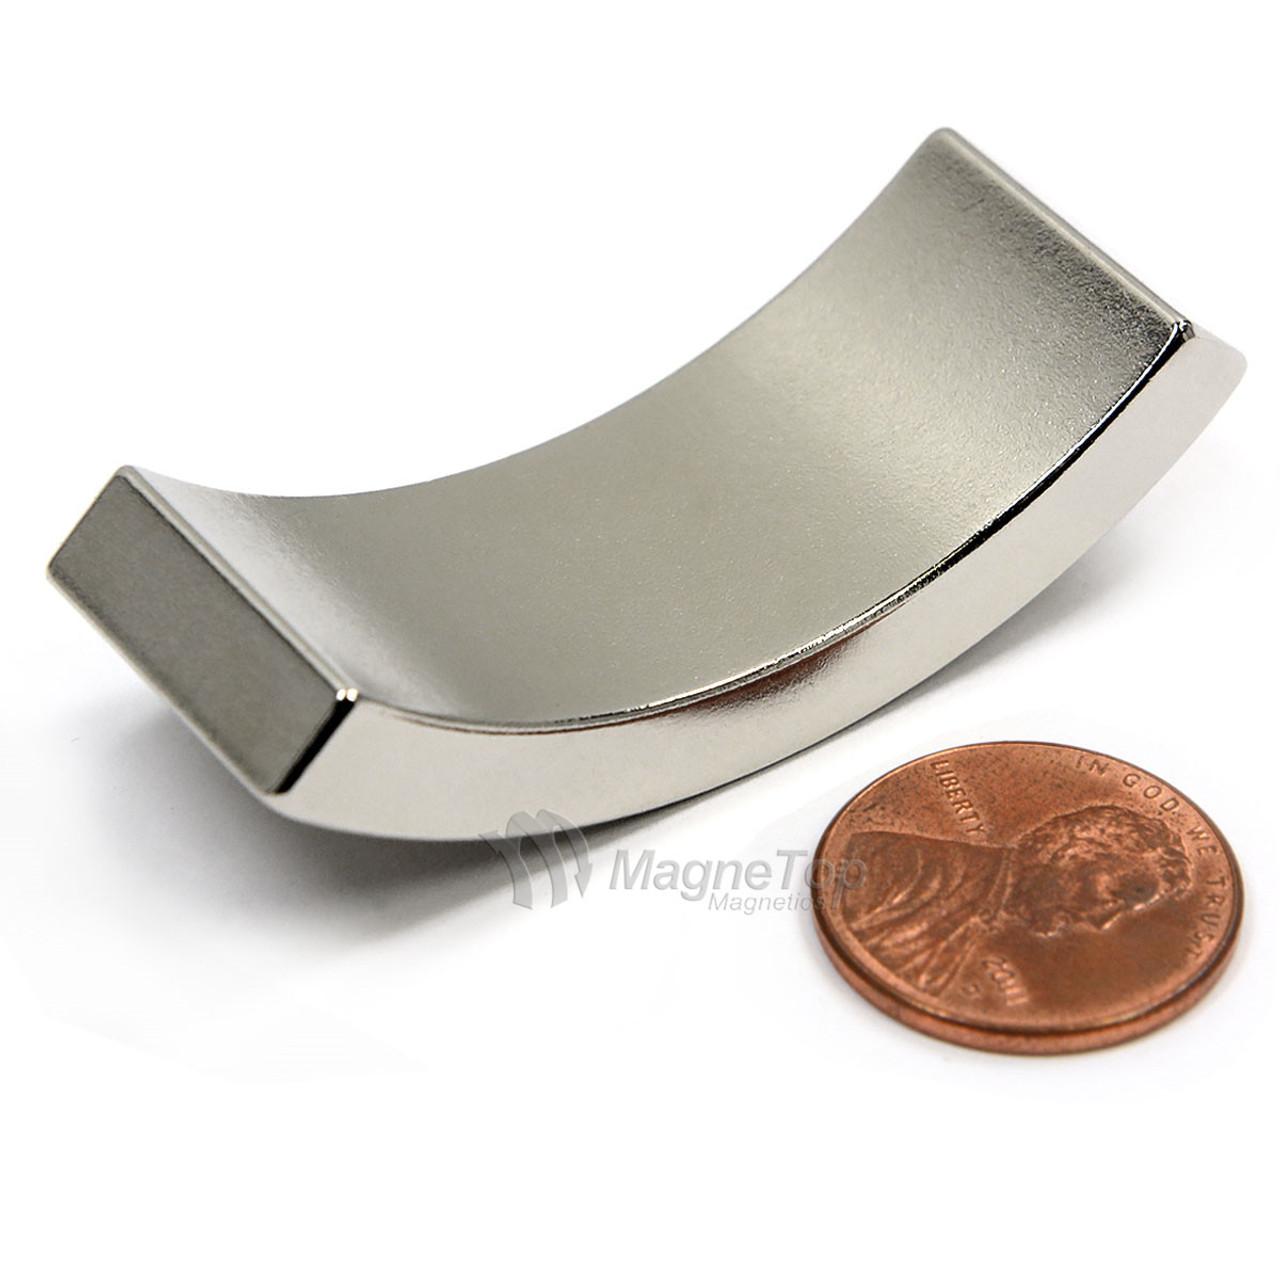 76.2mm (OD) x 63.5mm(ID) x 19mm 90 Degree -N42HT-S Pole Neodymium Arc